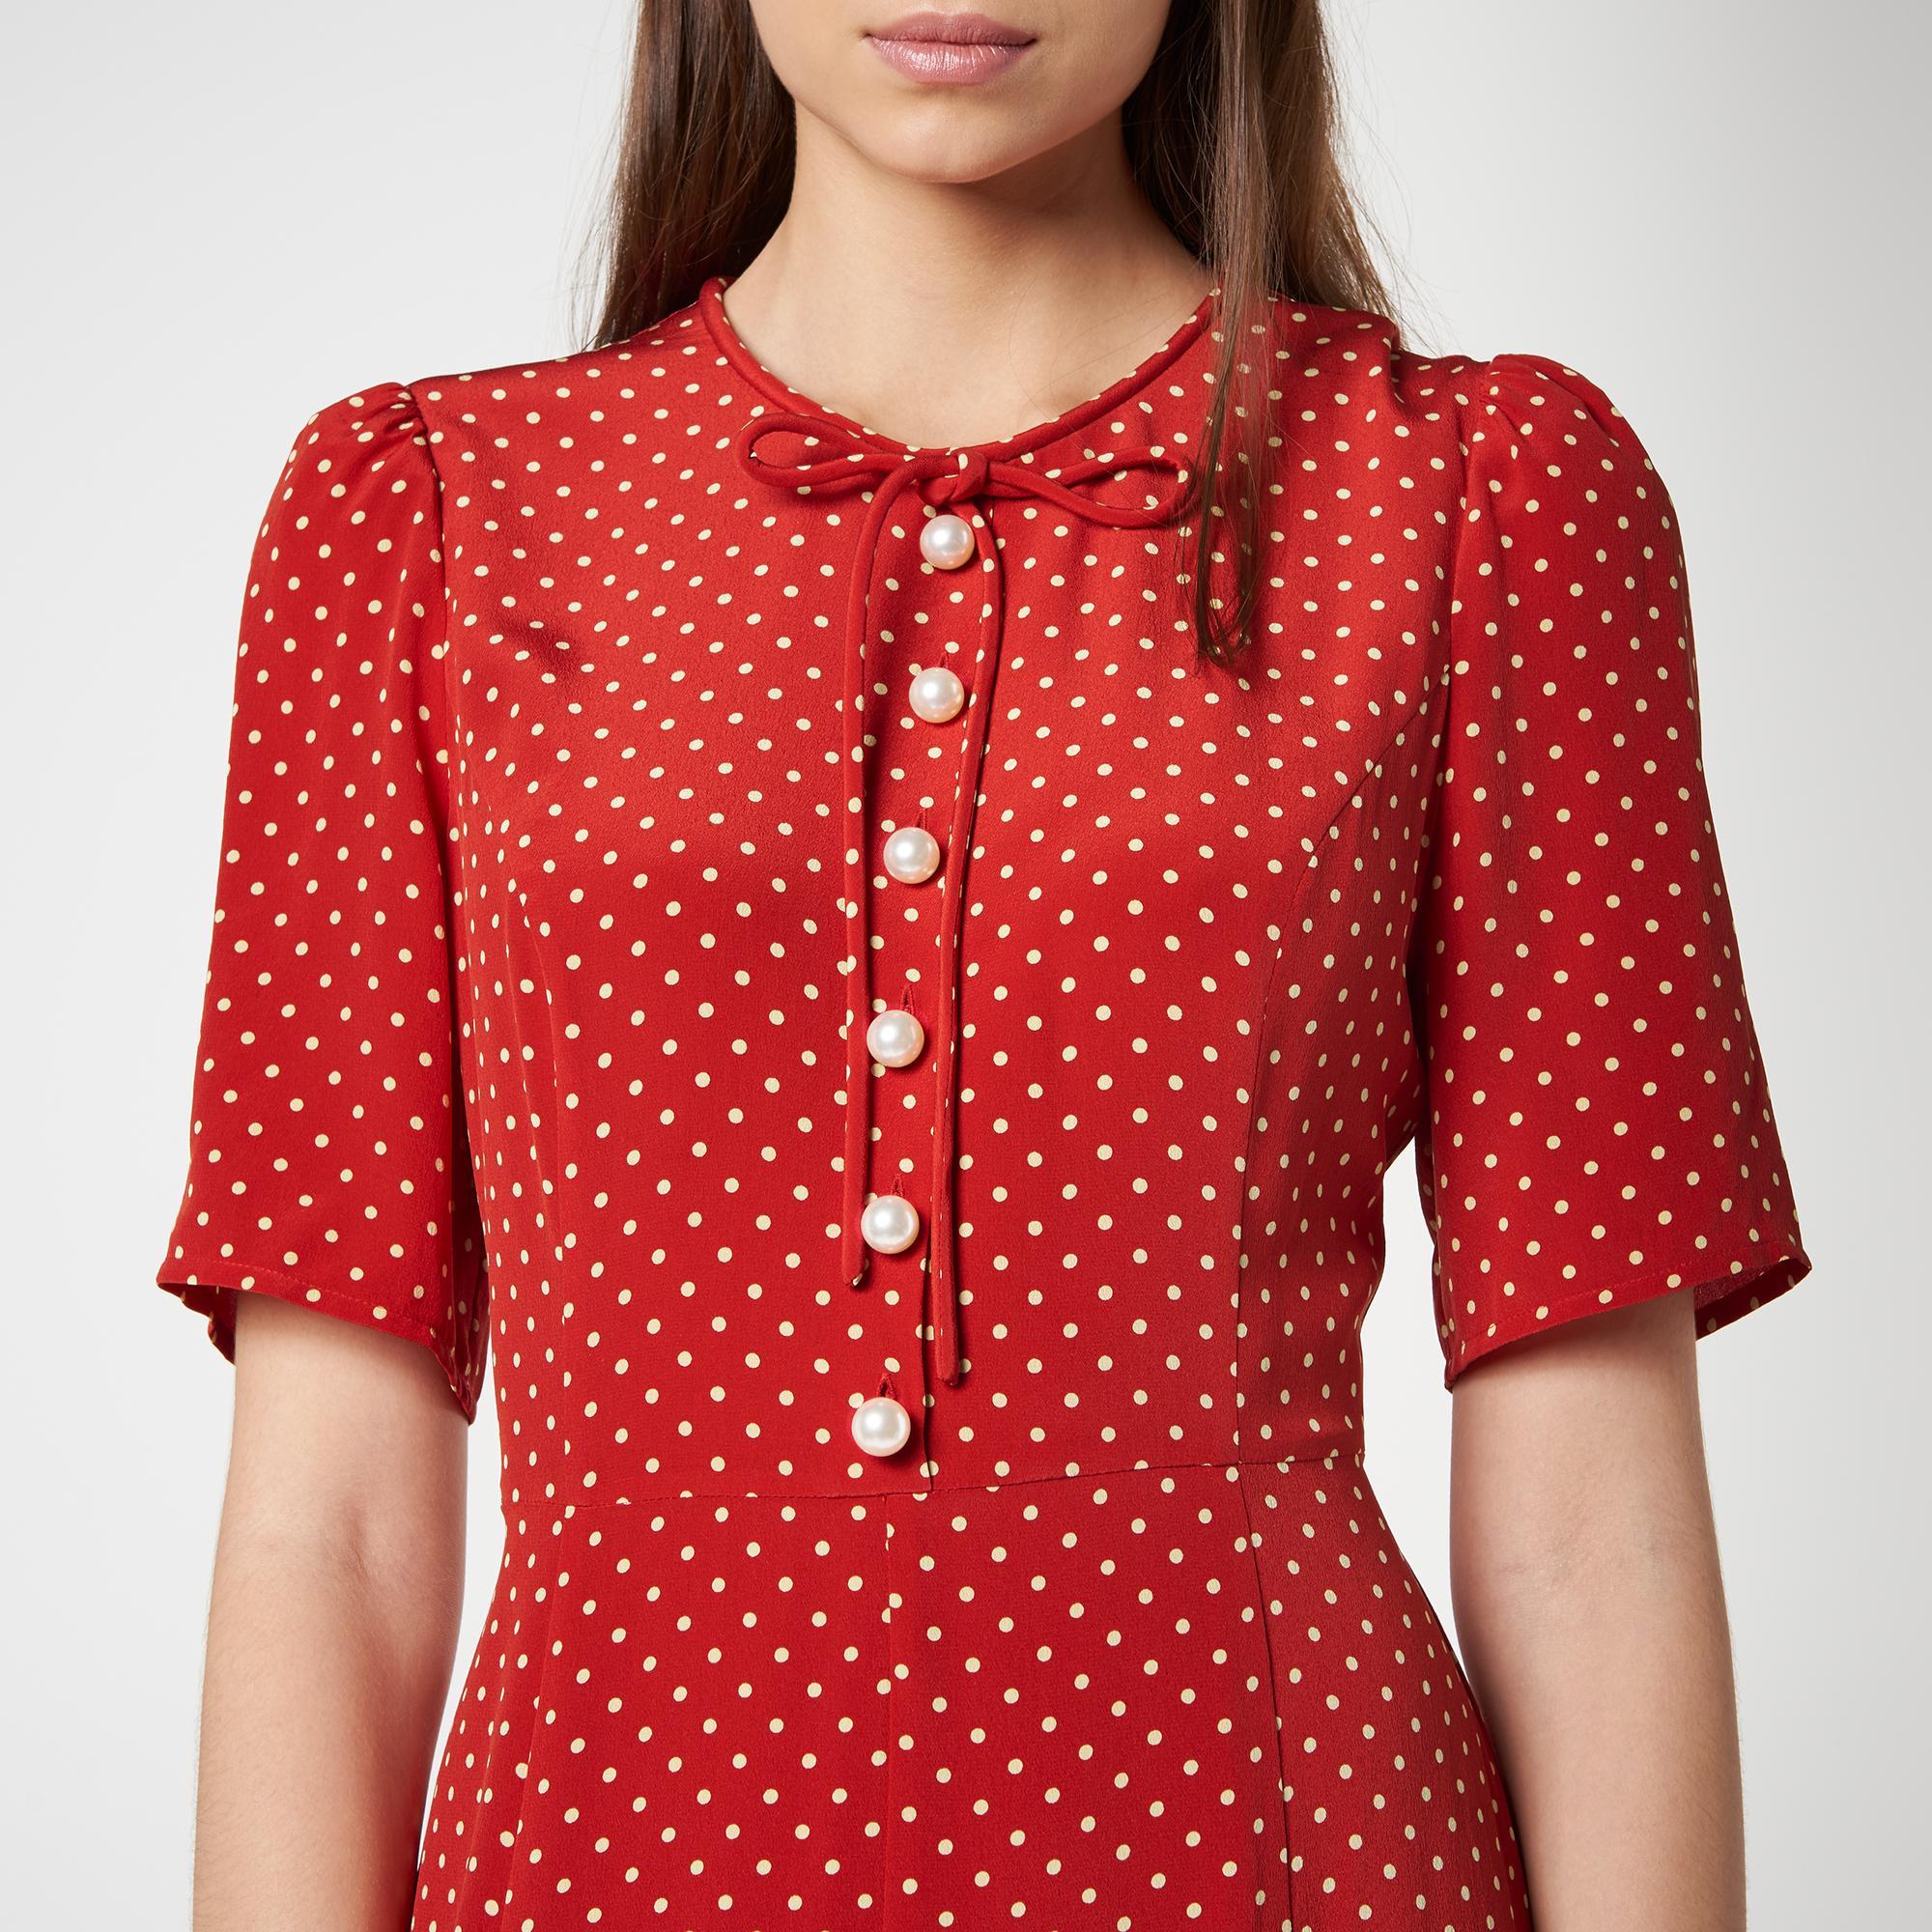 1e5a00fcd8a Cheap Red Polka Dot Dress Uk - Gomes Weine AG